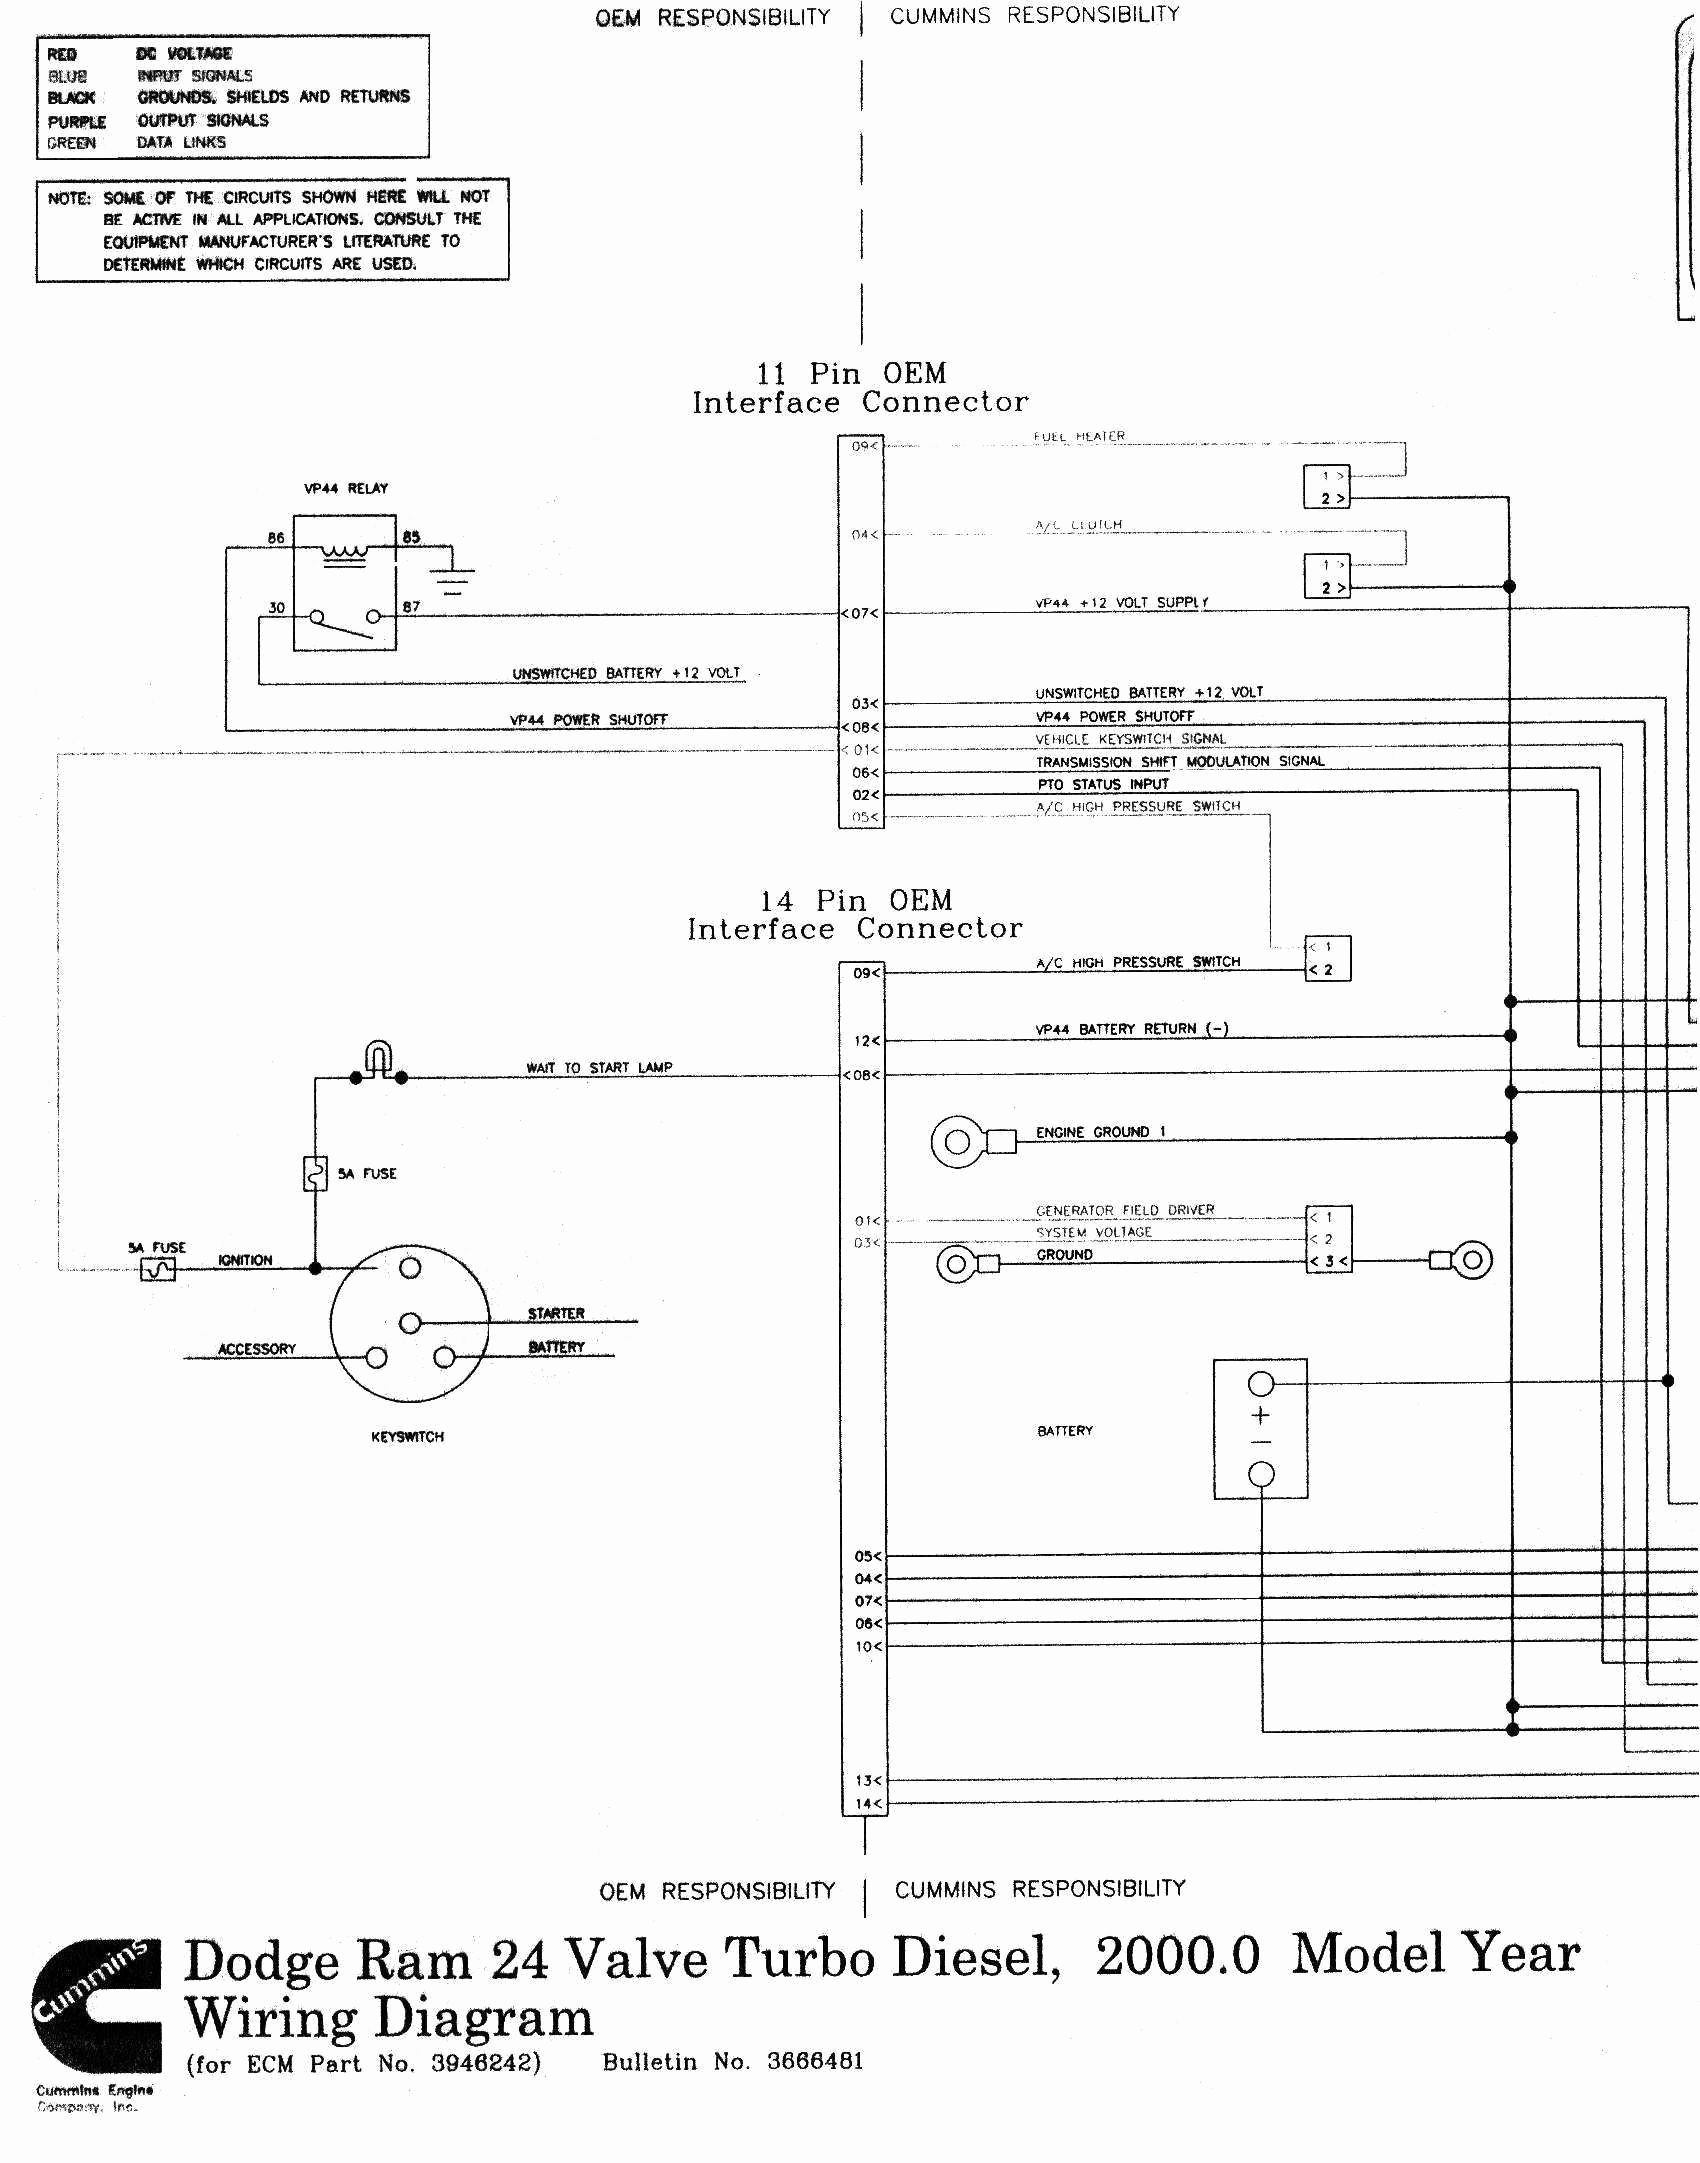 Ram Truck Wiring Diagram For 2014